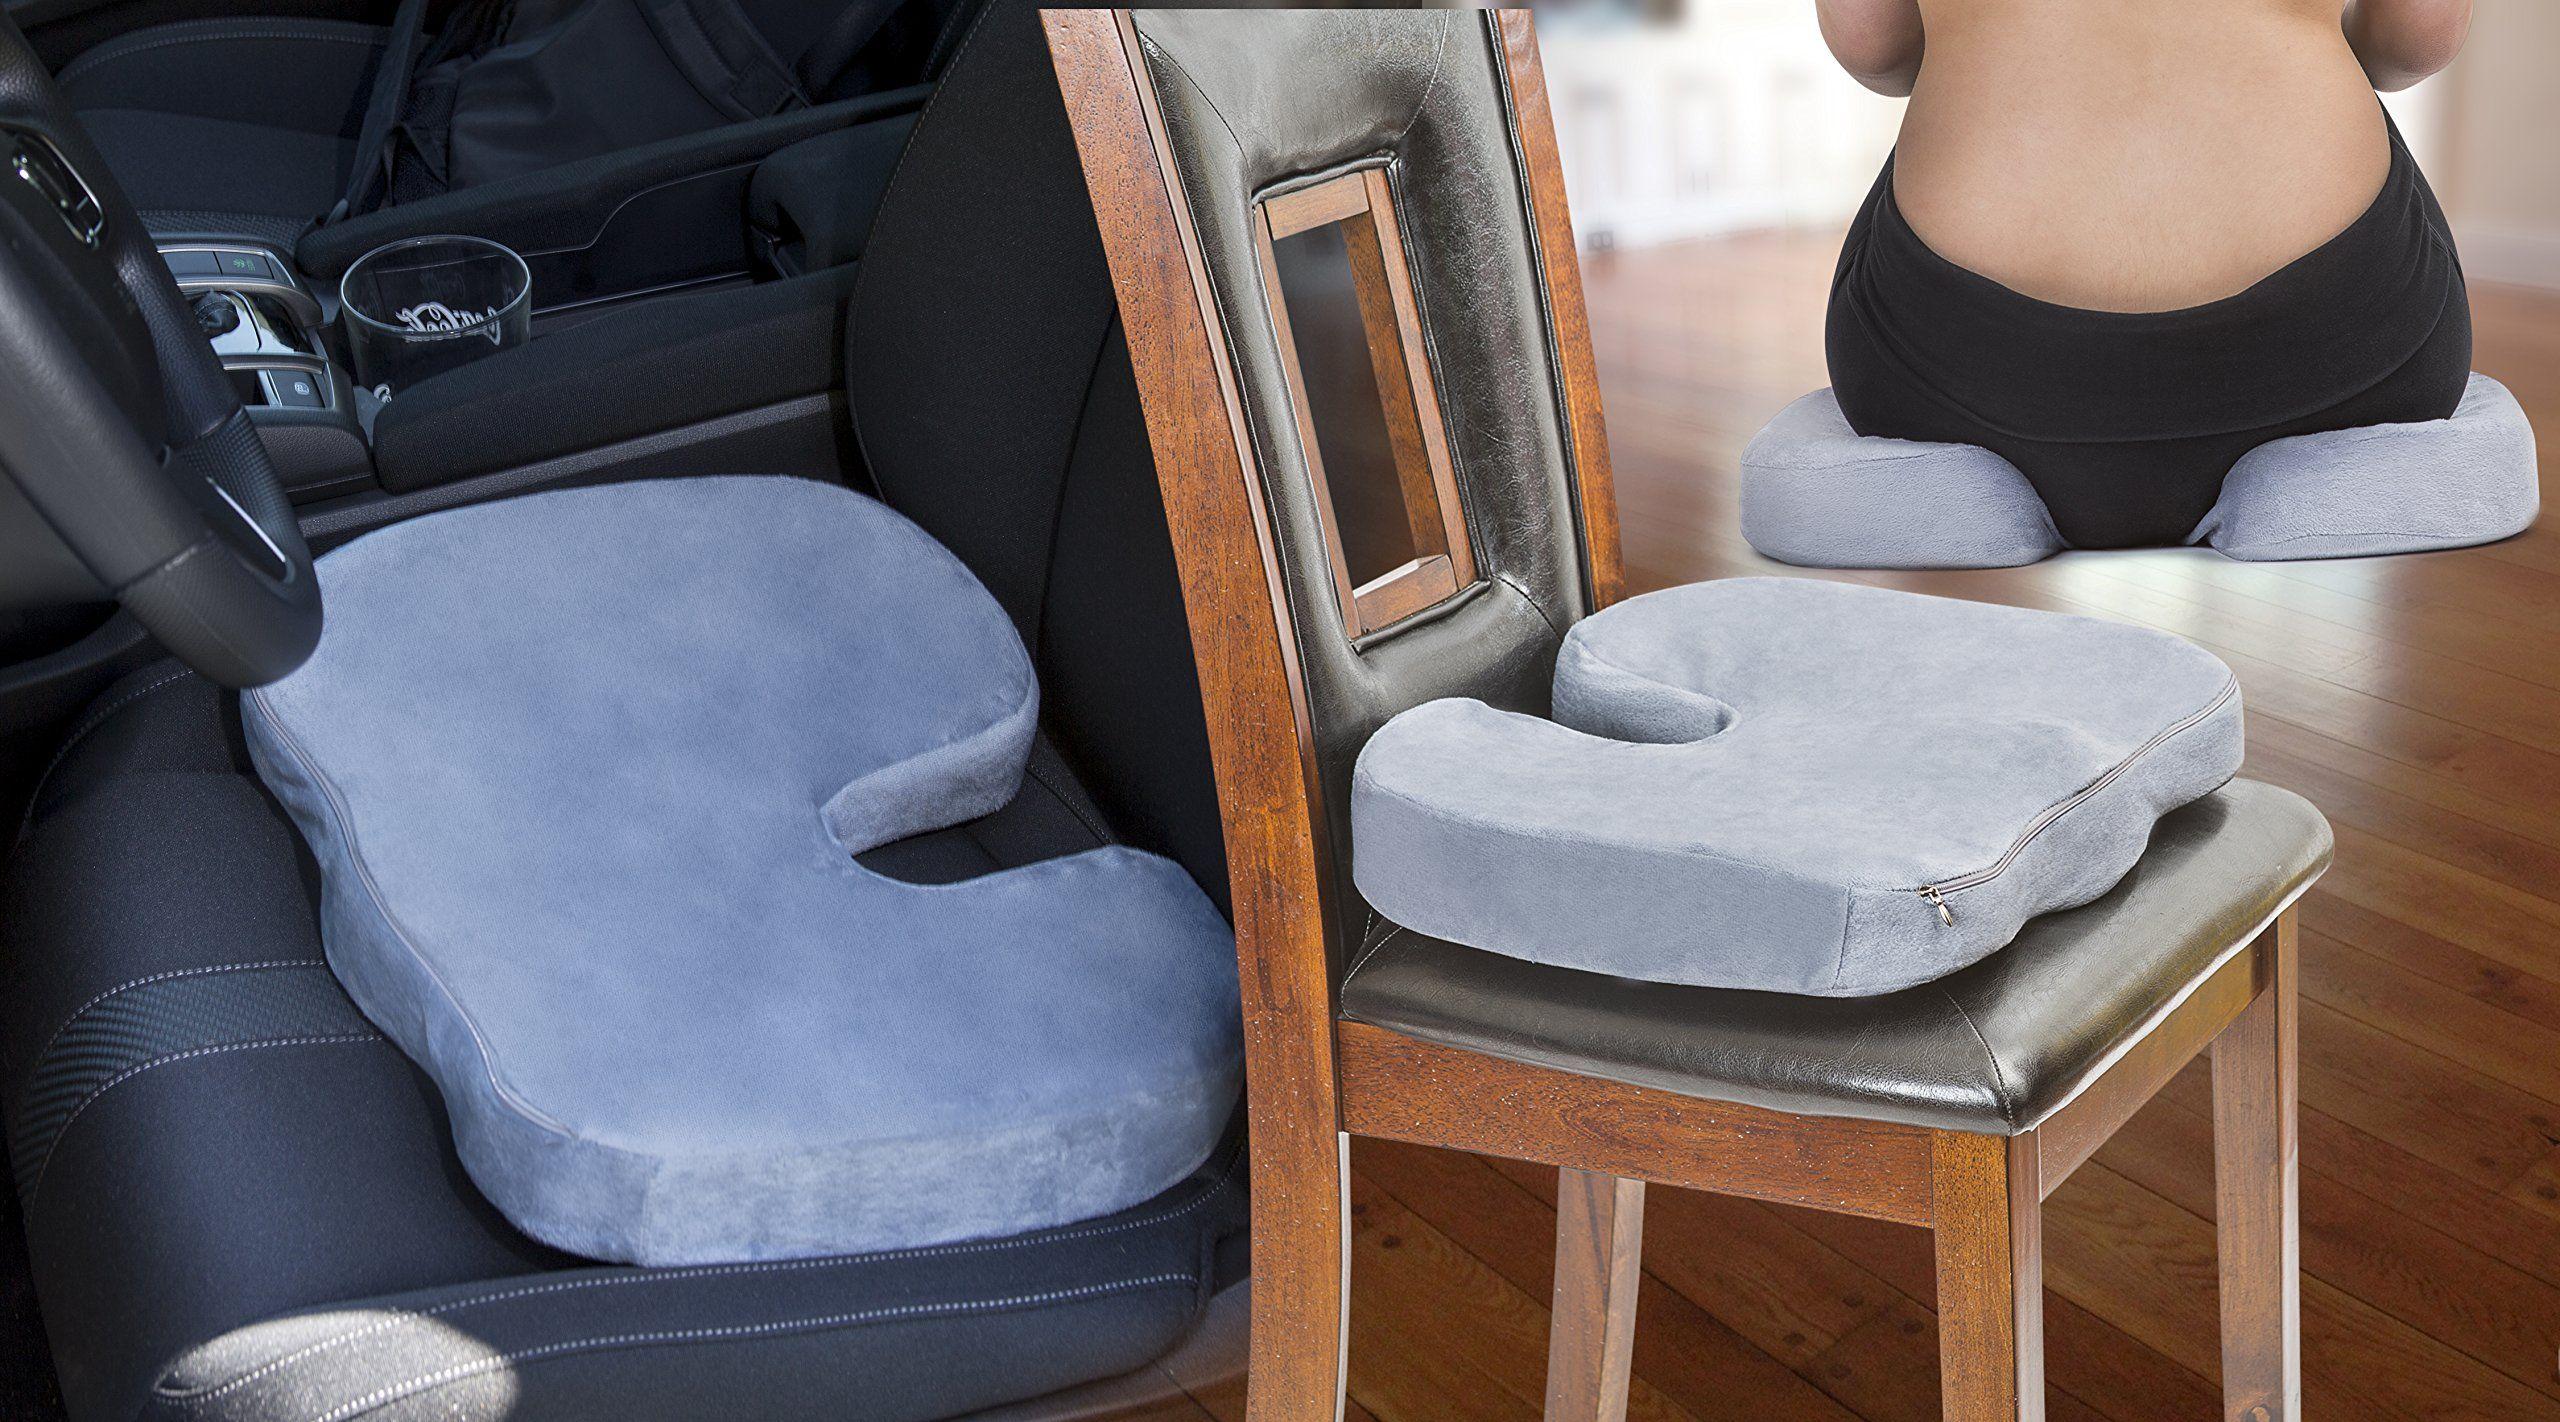 Dr flink coccyx seat cushion pillow gelenhanced memory foam quality